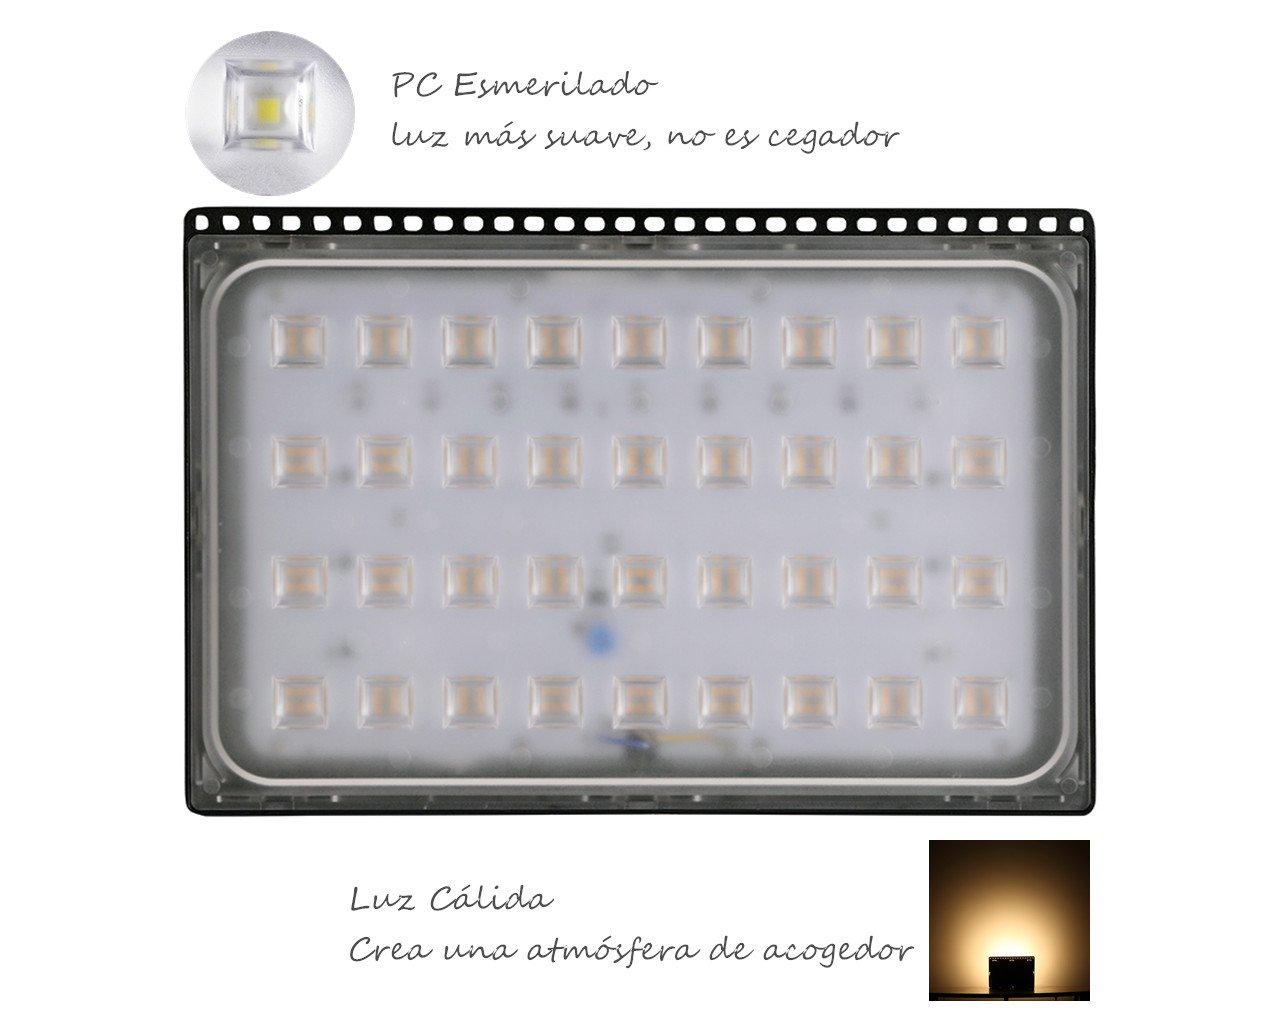 IP67 Impermeable 50w Luz C/álida: 6000-6500K 1 pcs Iluminaci/ón Interior y Exterior Yuanline LED Slim Foco Proyector 2835 LED Bombilla